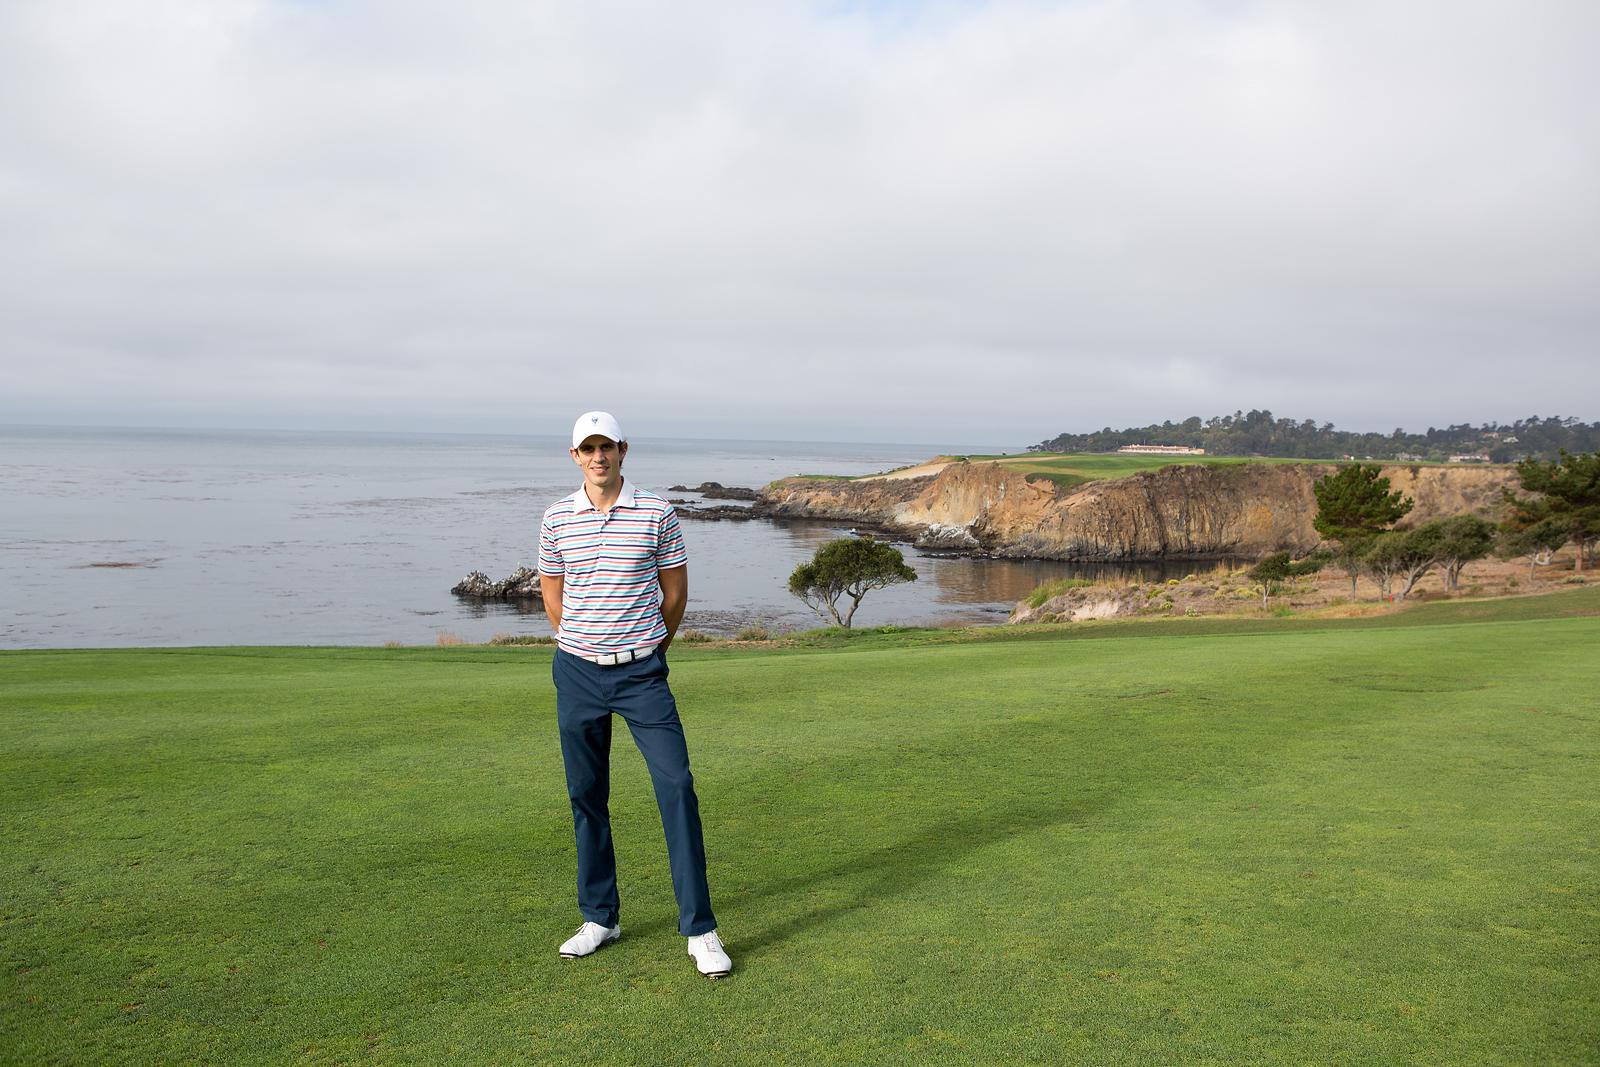 Bucket list golf trip at Pebble Beach